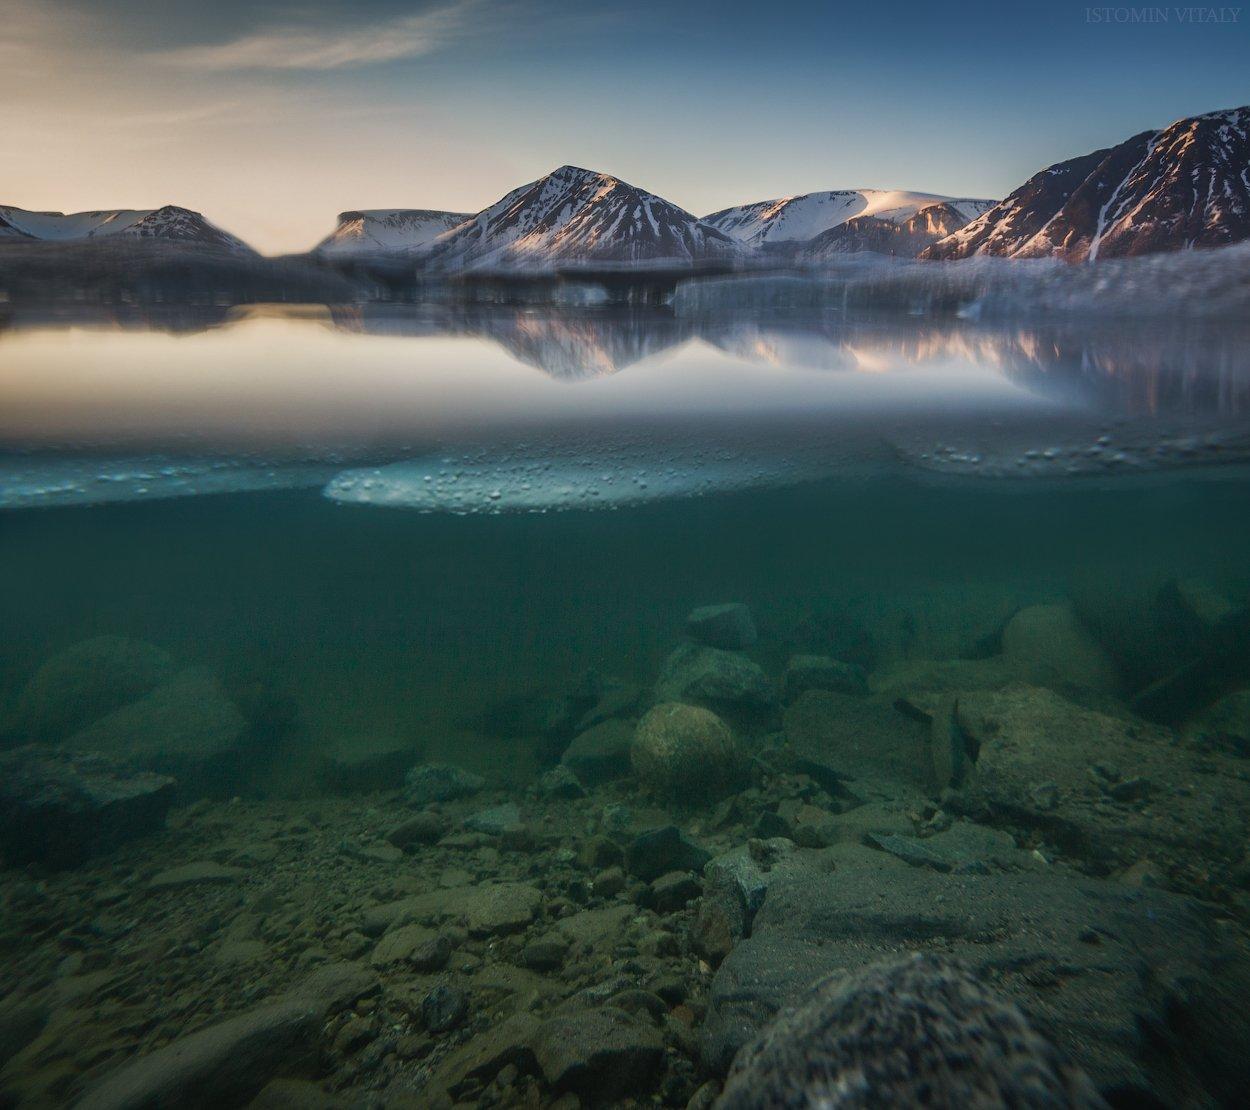 пейзаж,вода,озеро,лед,весна, Истомин Виталий